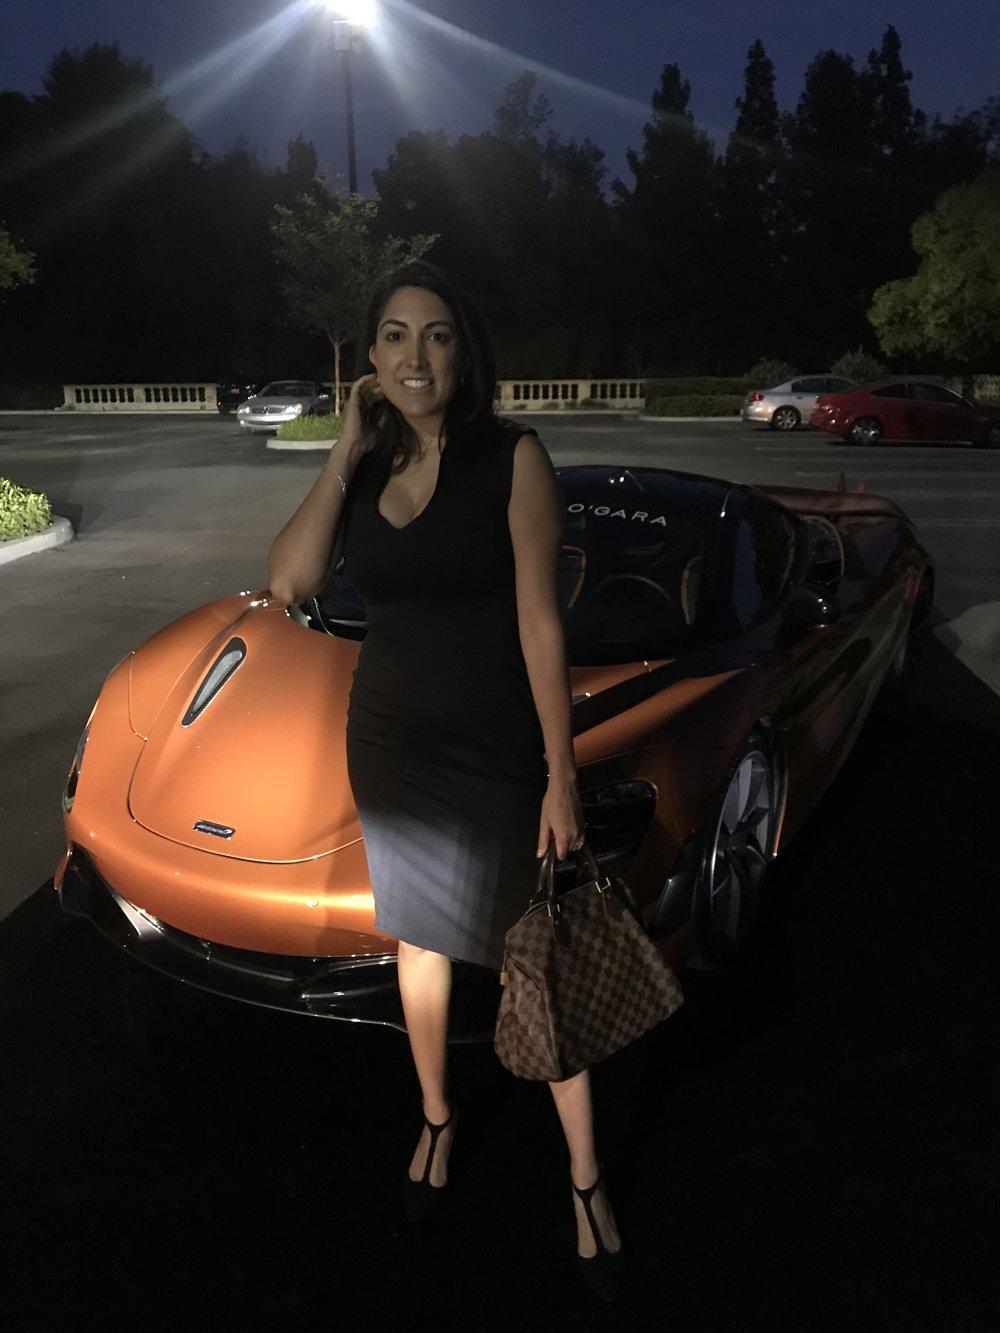 Luxury Vehicle Provided by O'Gara